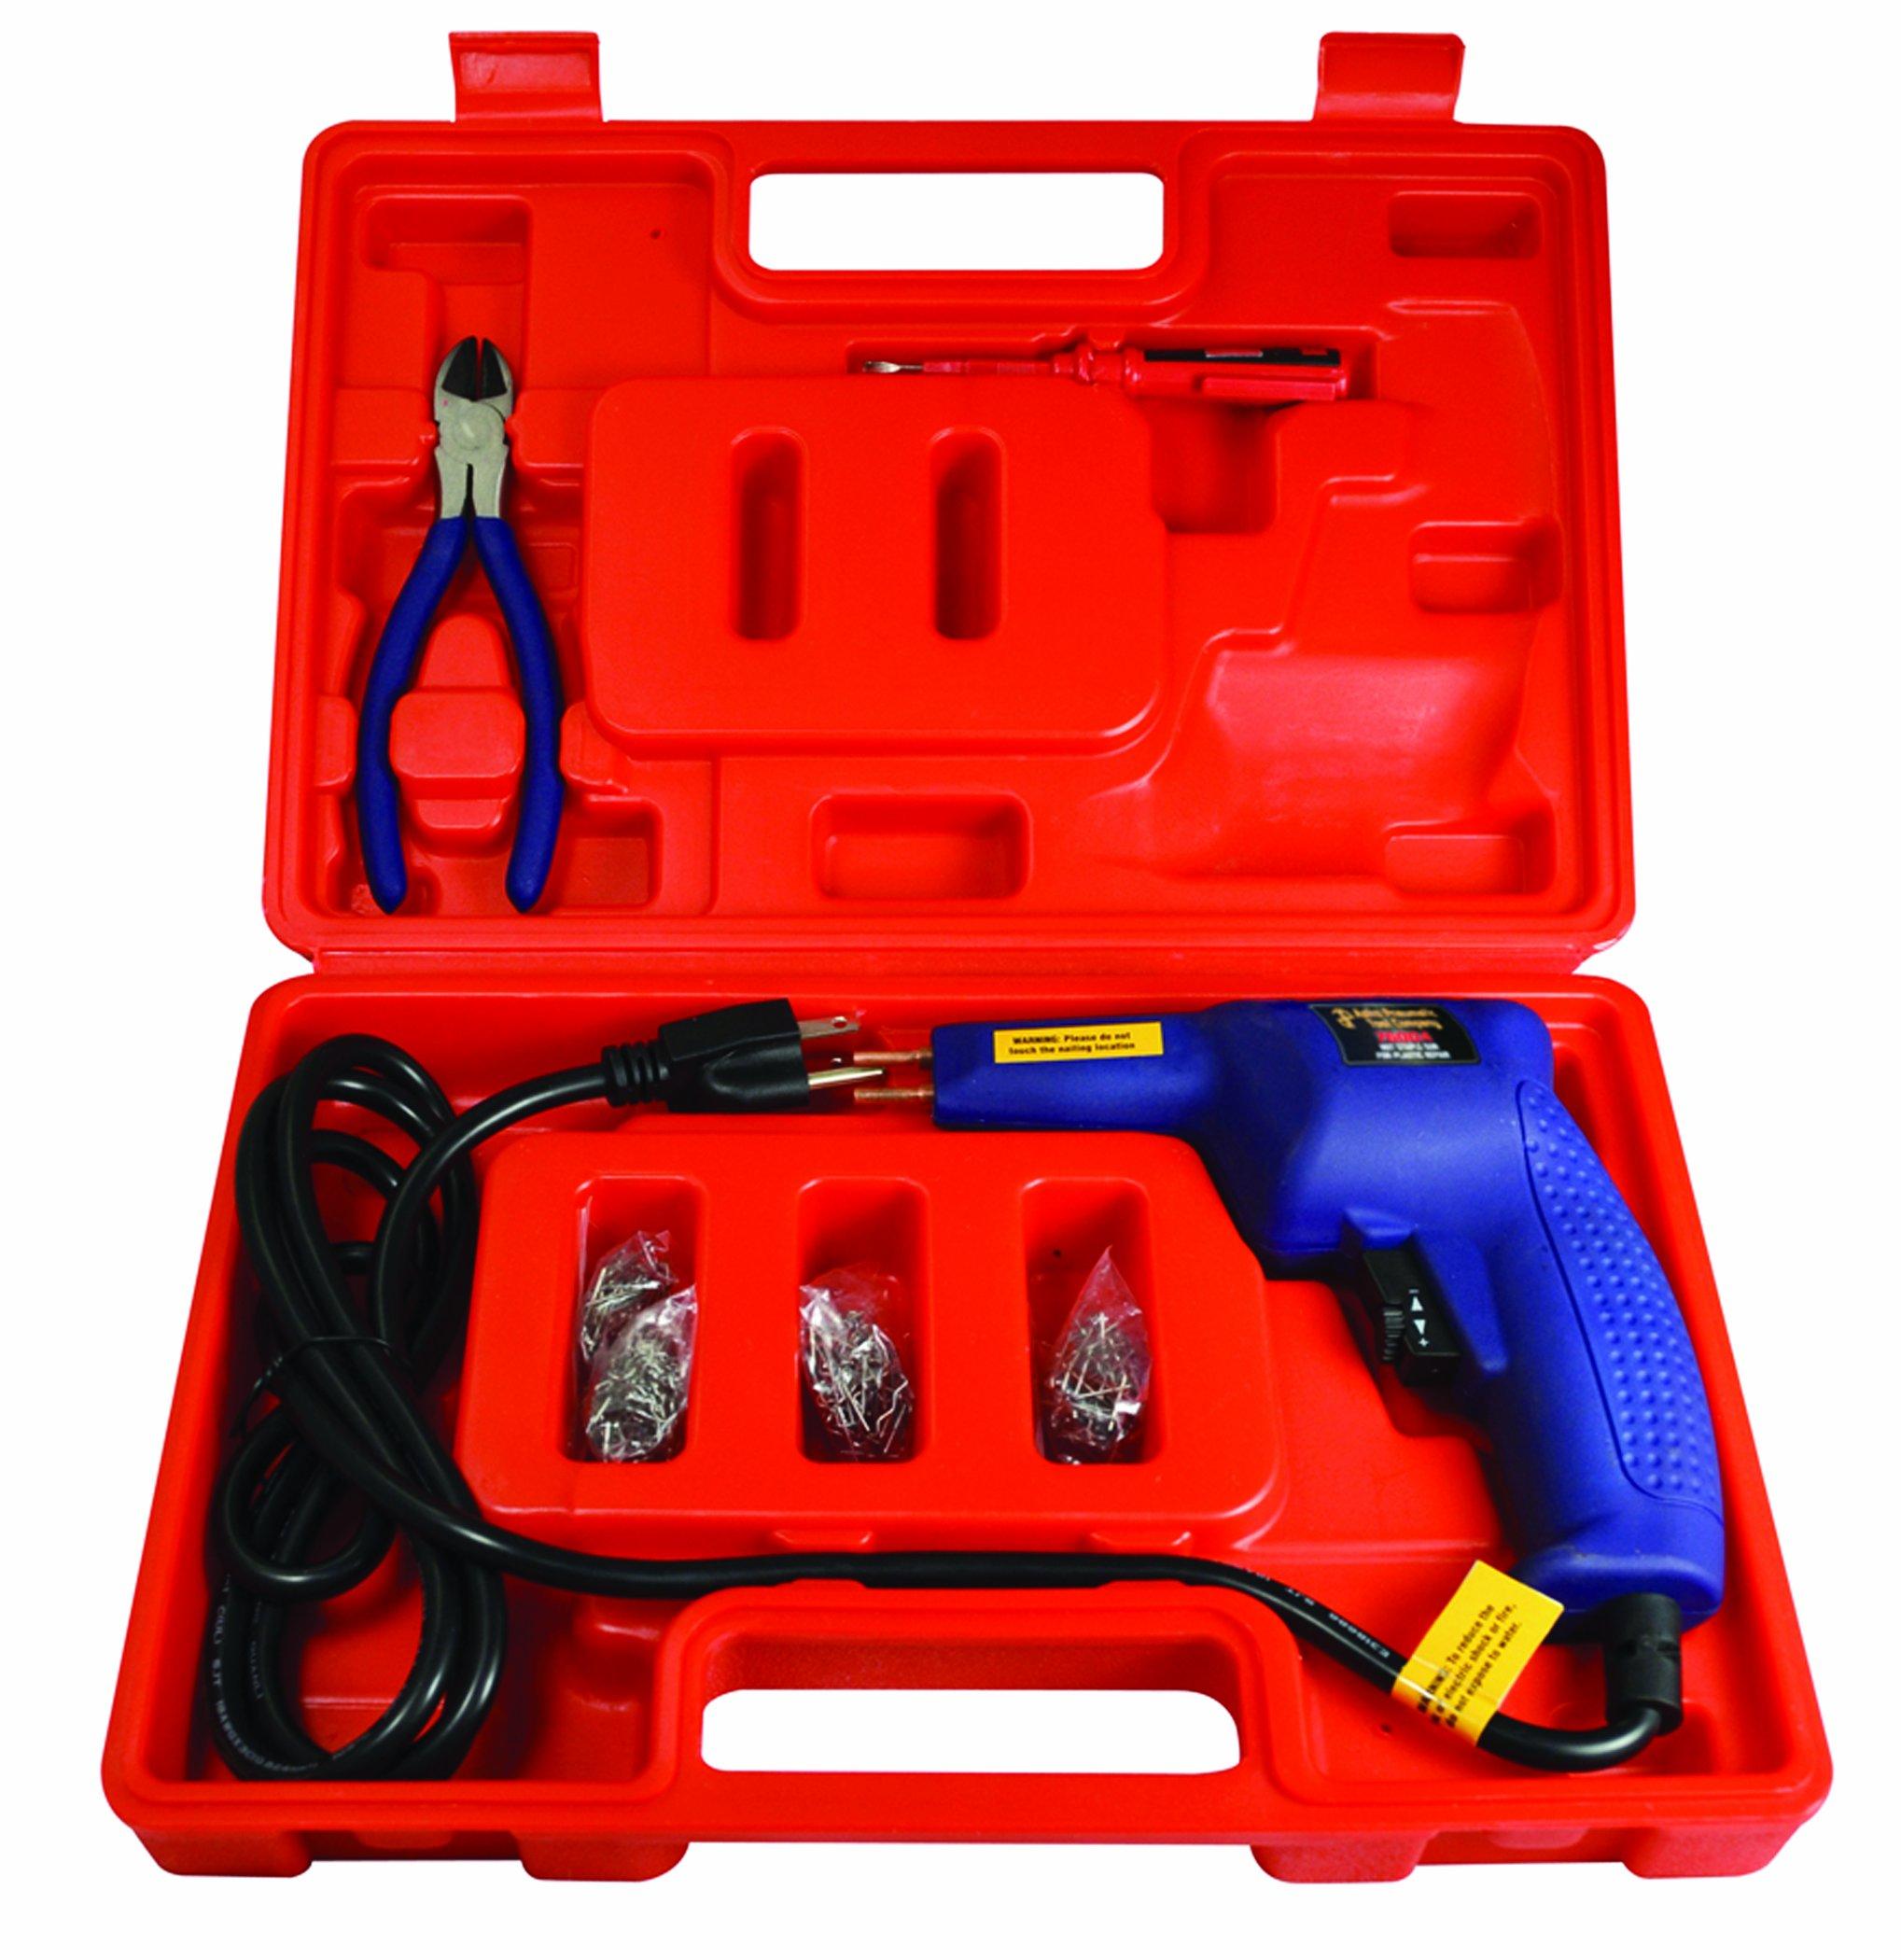 Astro  7600 Hot Staple Gun Kit for Plastic Repair